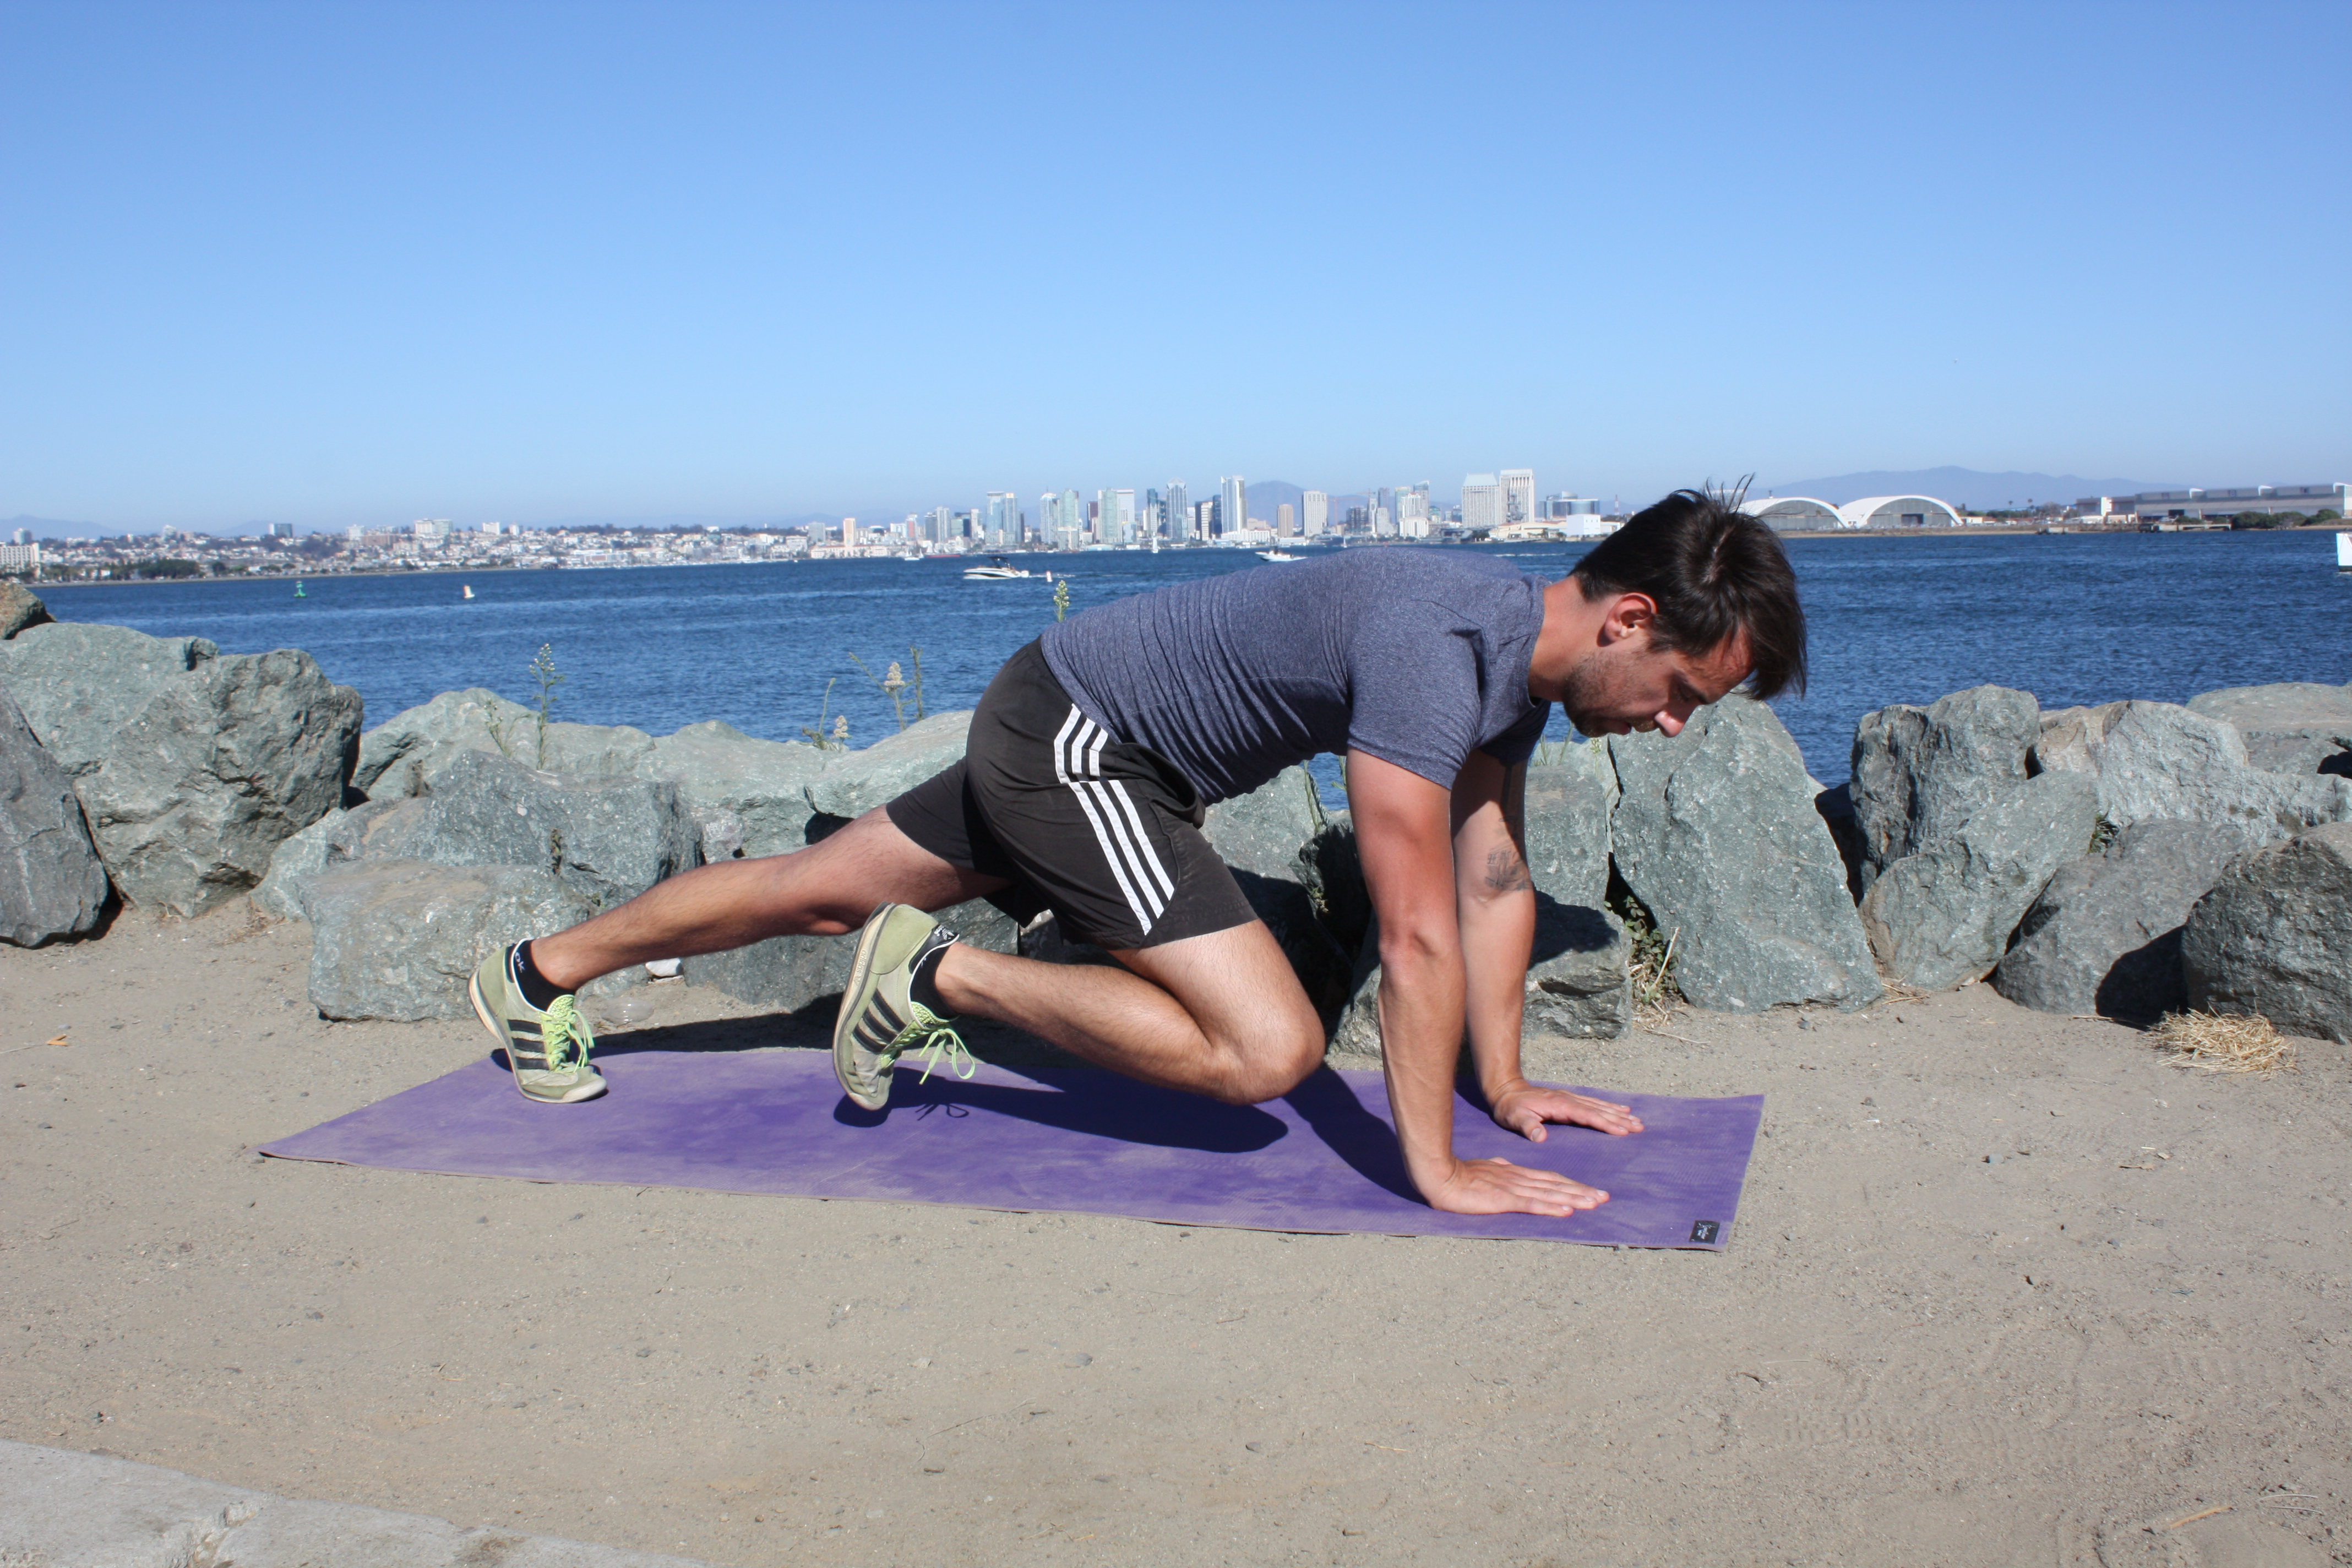 Personal Training Wien, abnehmen, Gewicht verliere